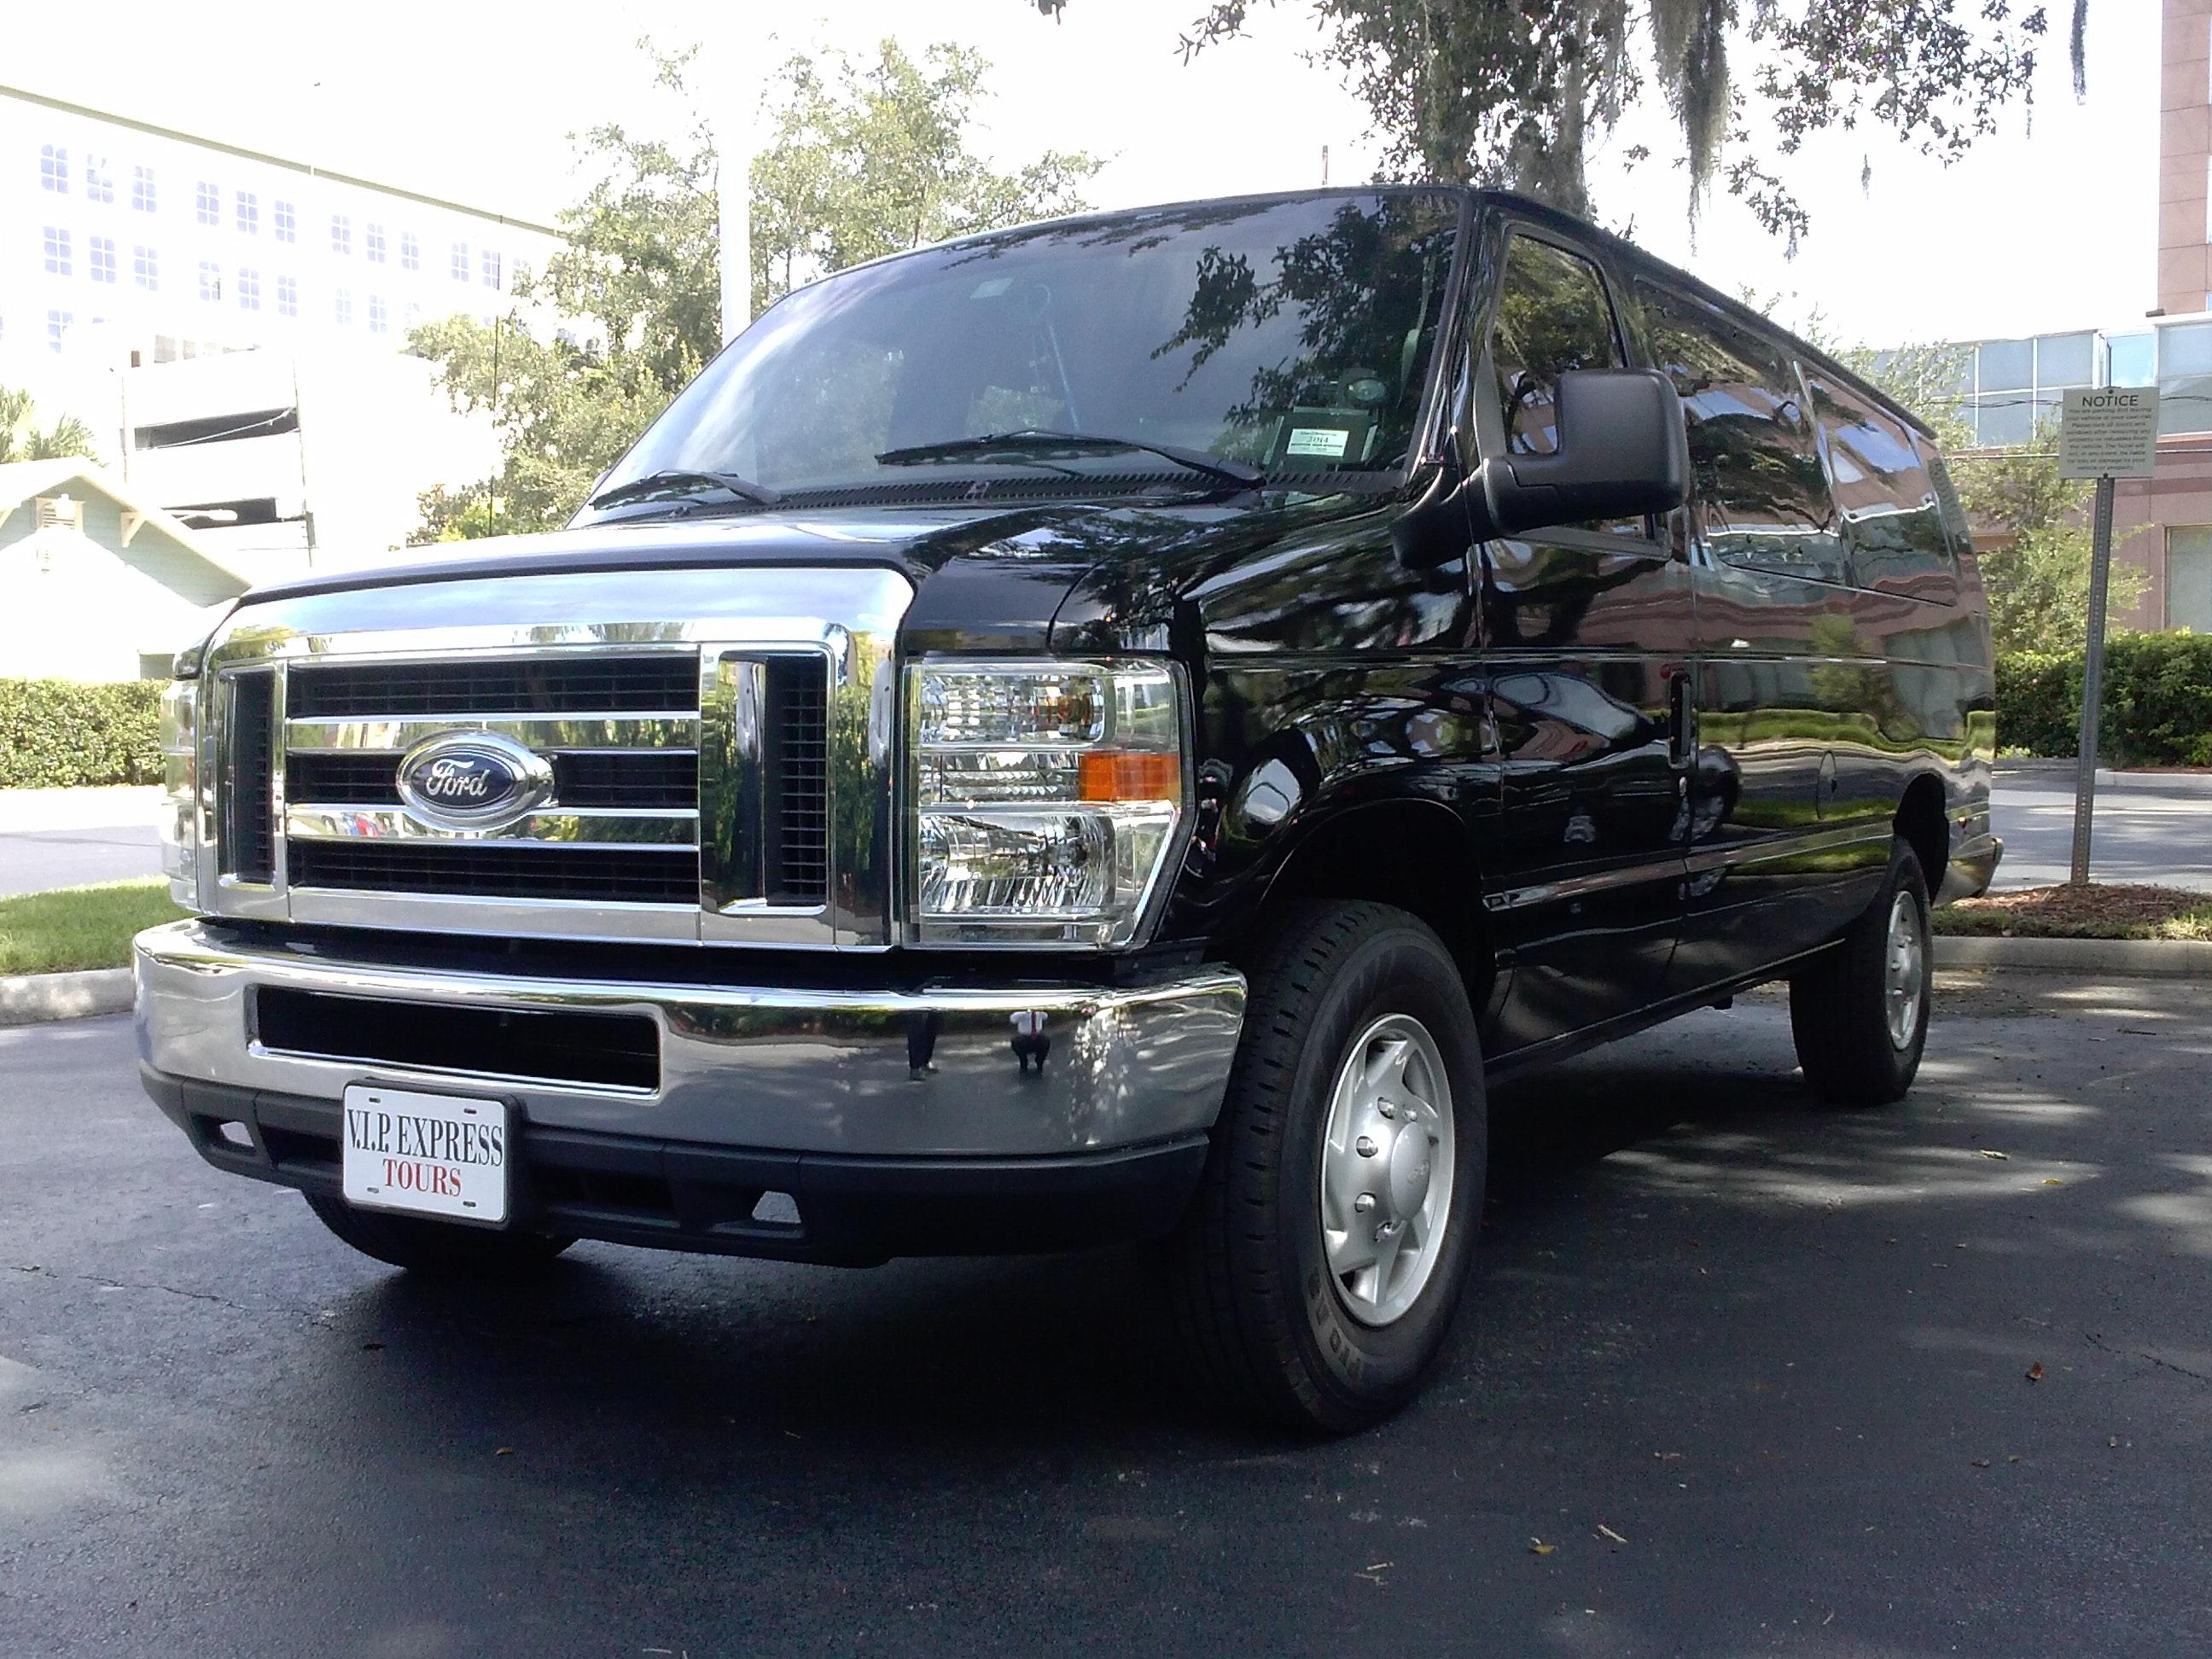 VIP Express Tours Transportation vehicle 1